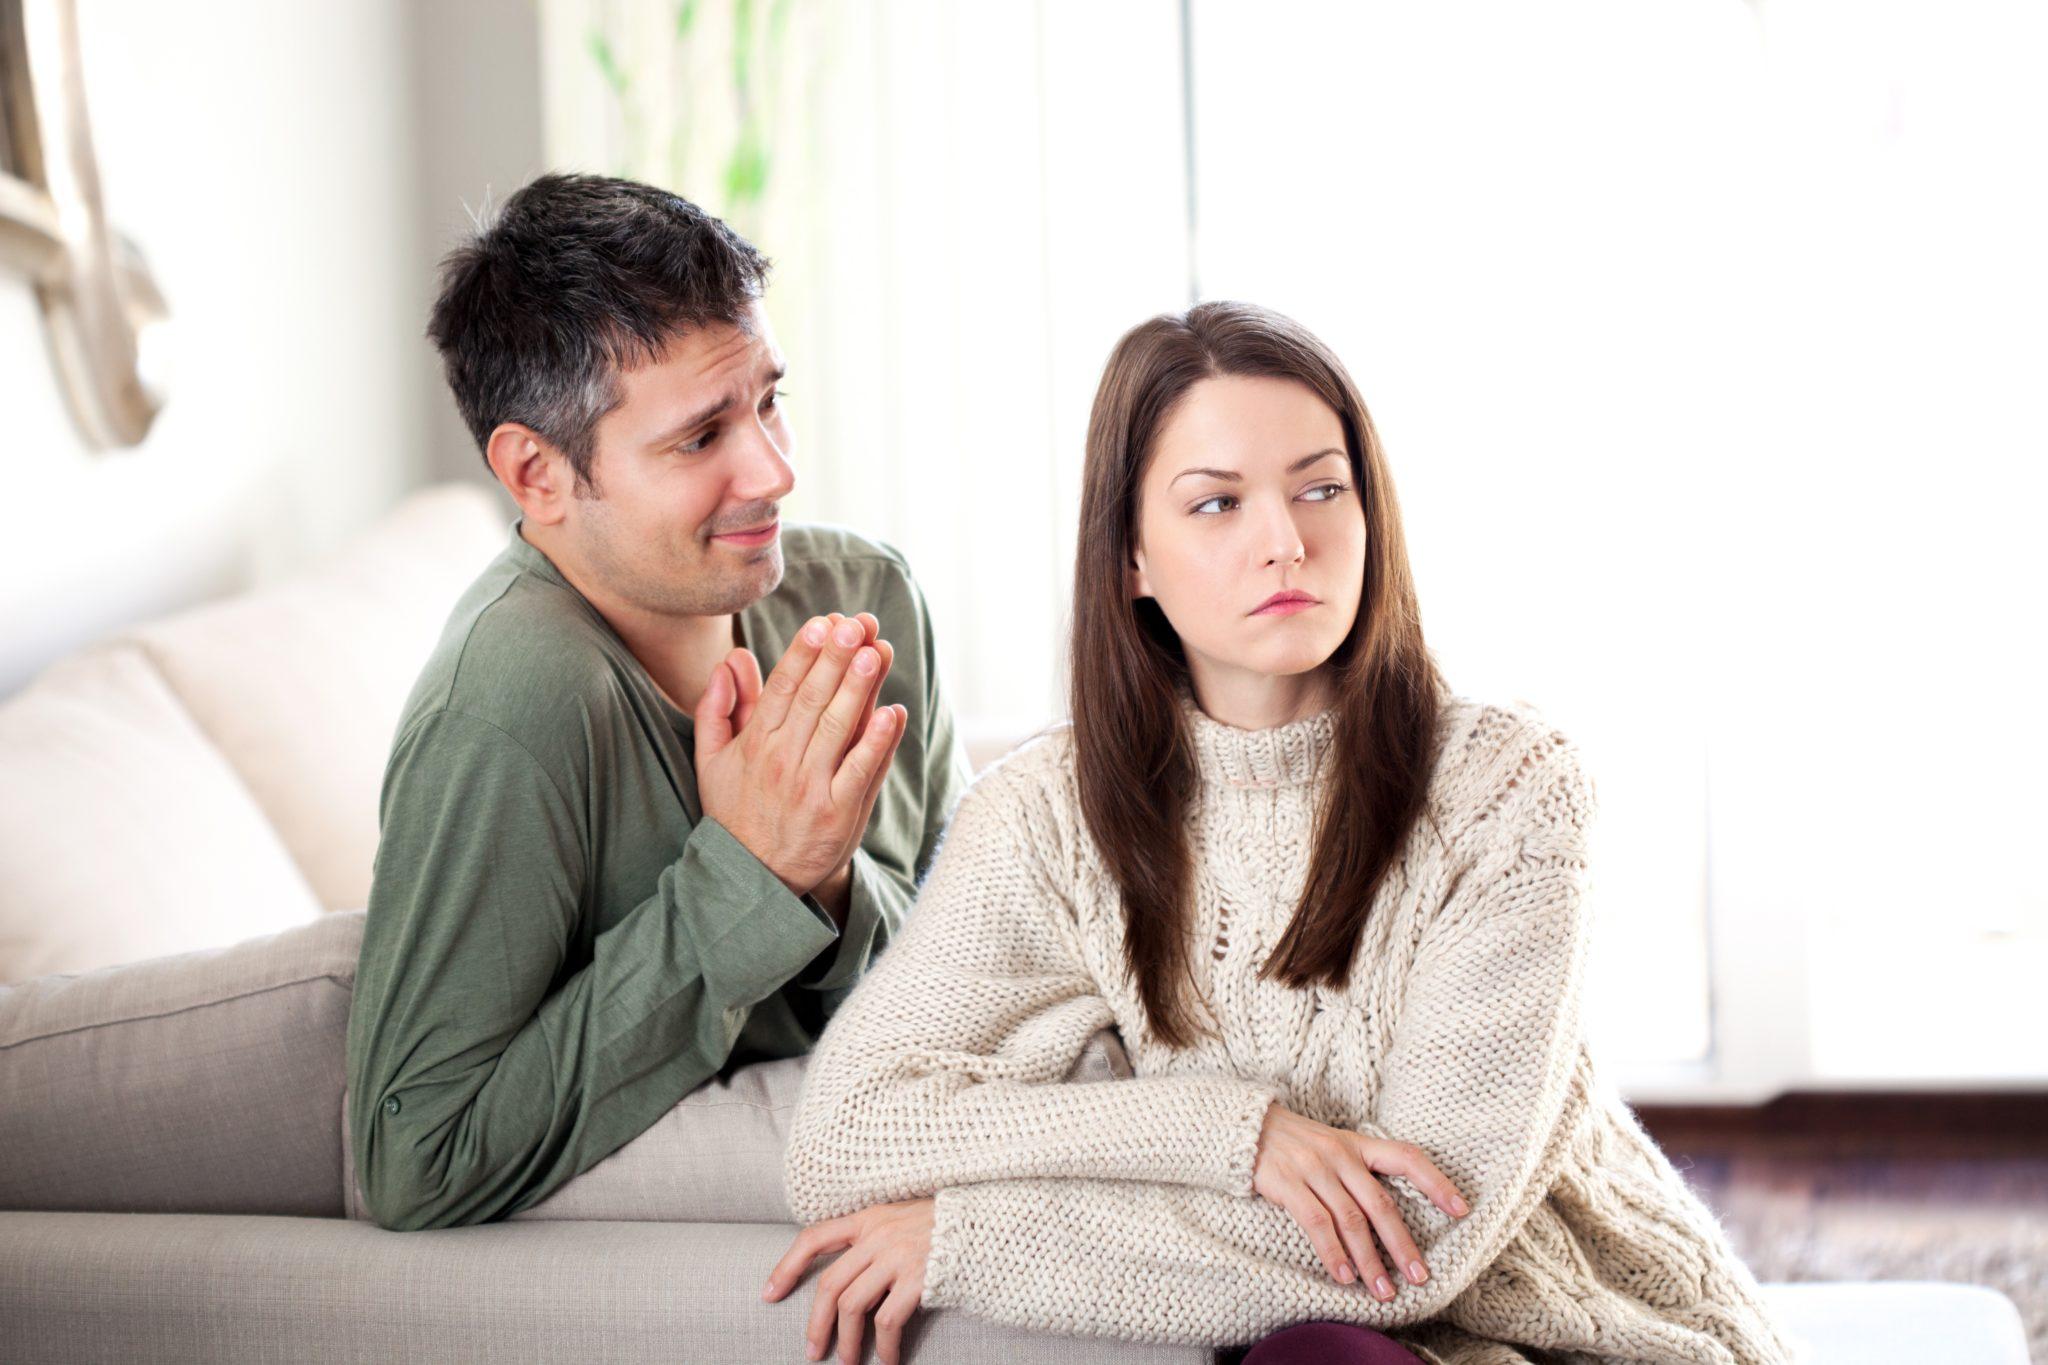 Как приворожить женатого мужчину без последствия в домашних условиях без фото